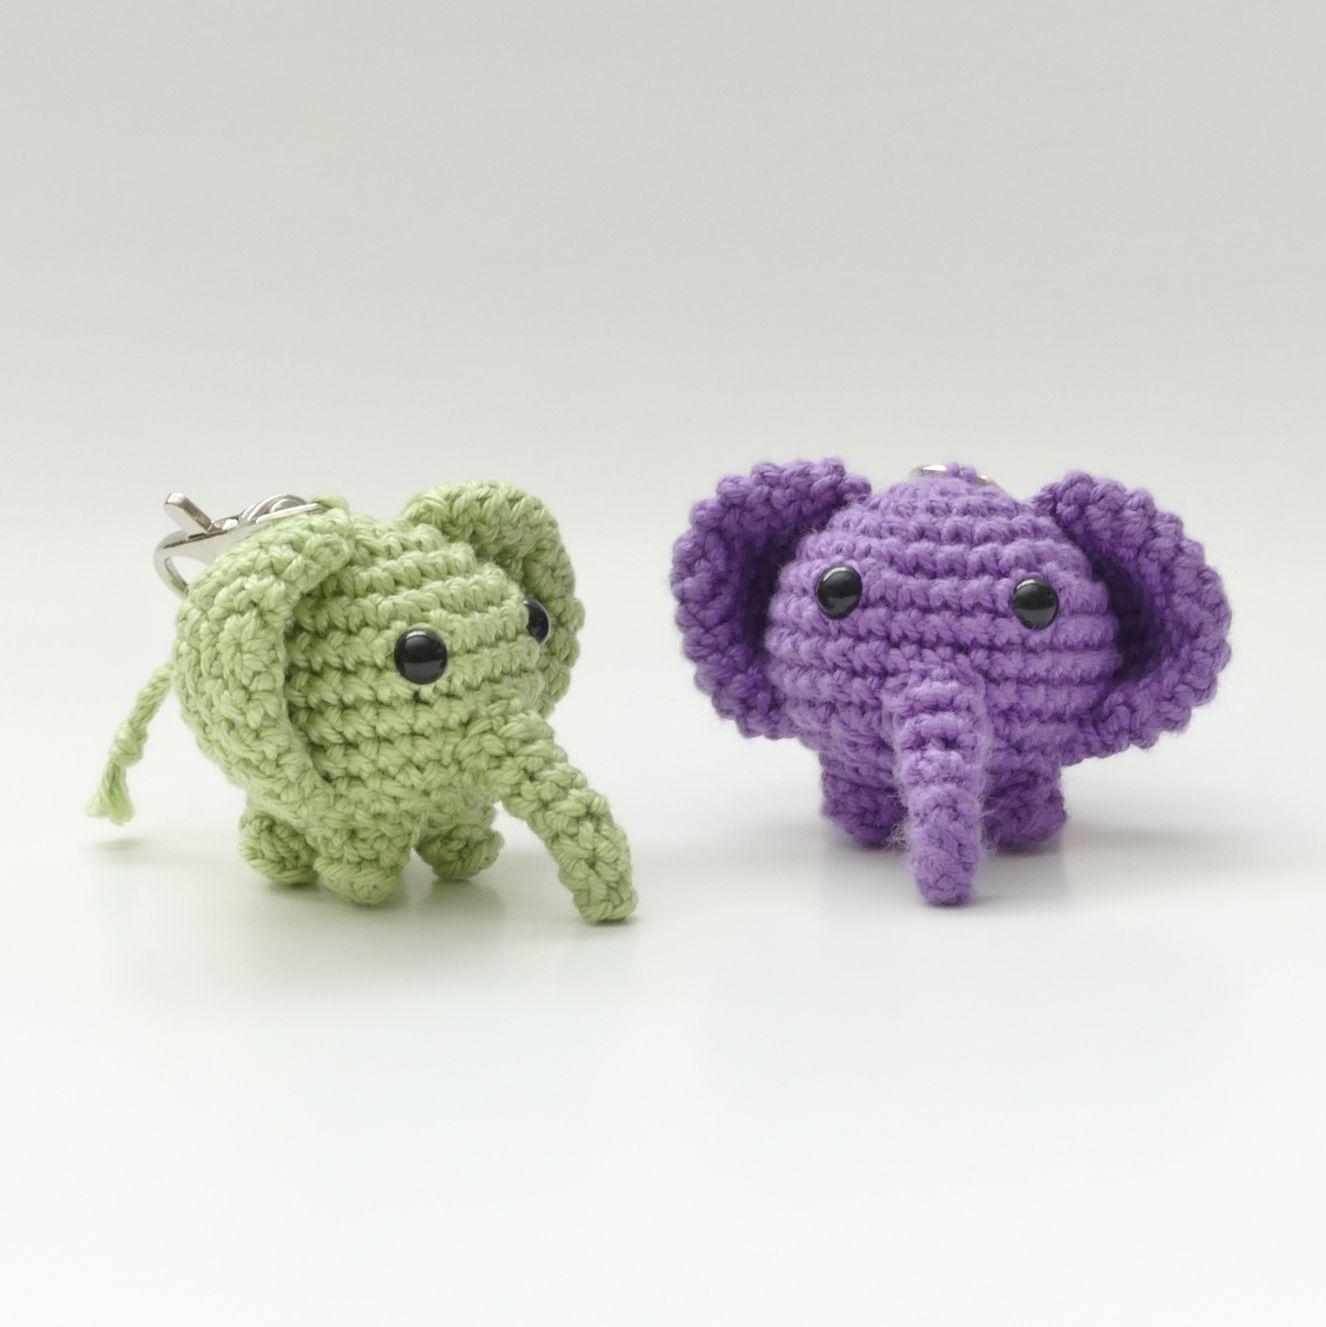 Amigurumi Elephant Keychain - Free Pattern | Krafty Kait - Crochet ...